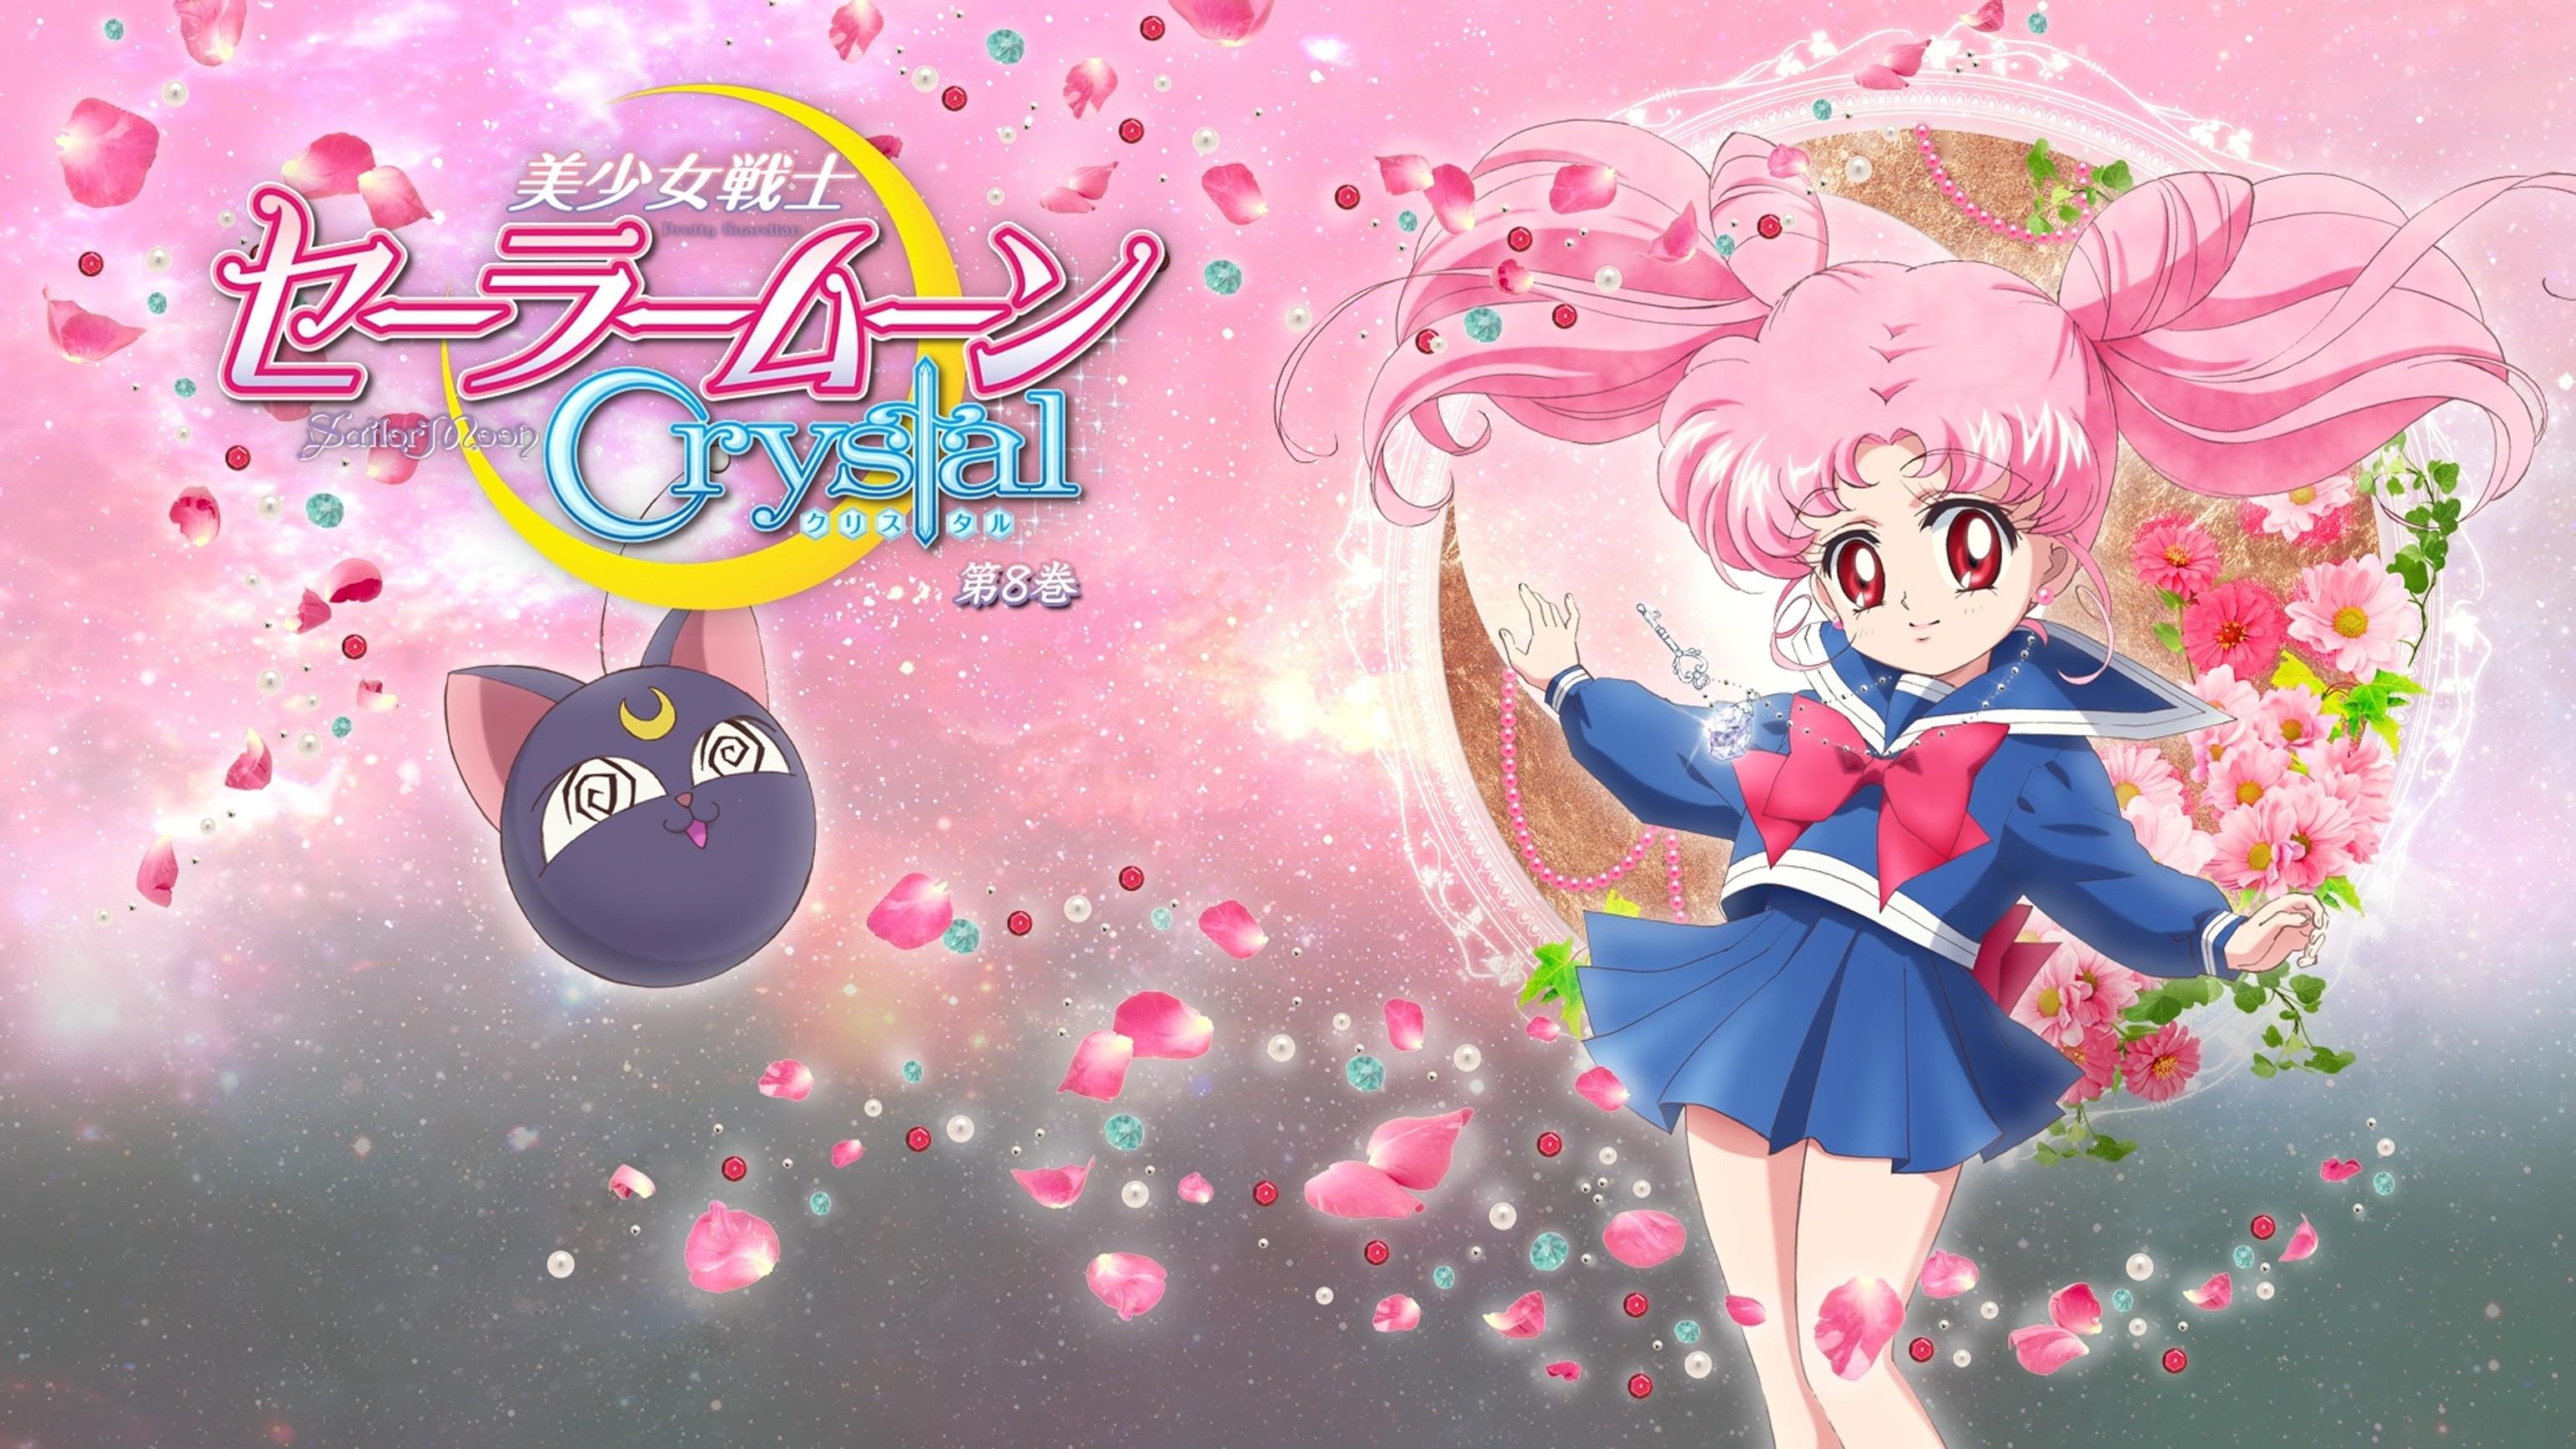 Wallpaper HD Sailor Moon Crystal DVD 8